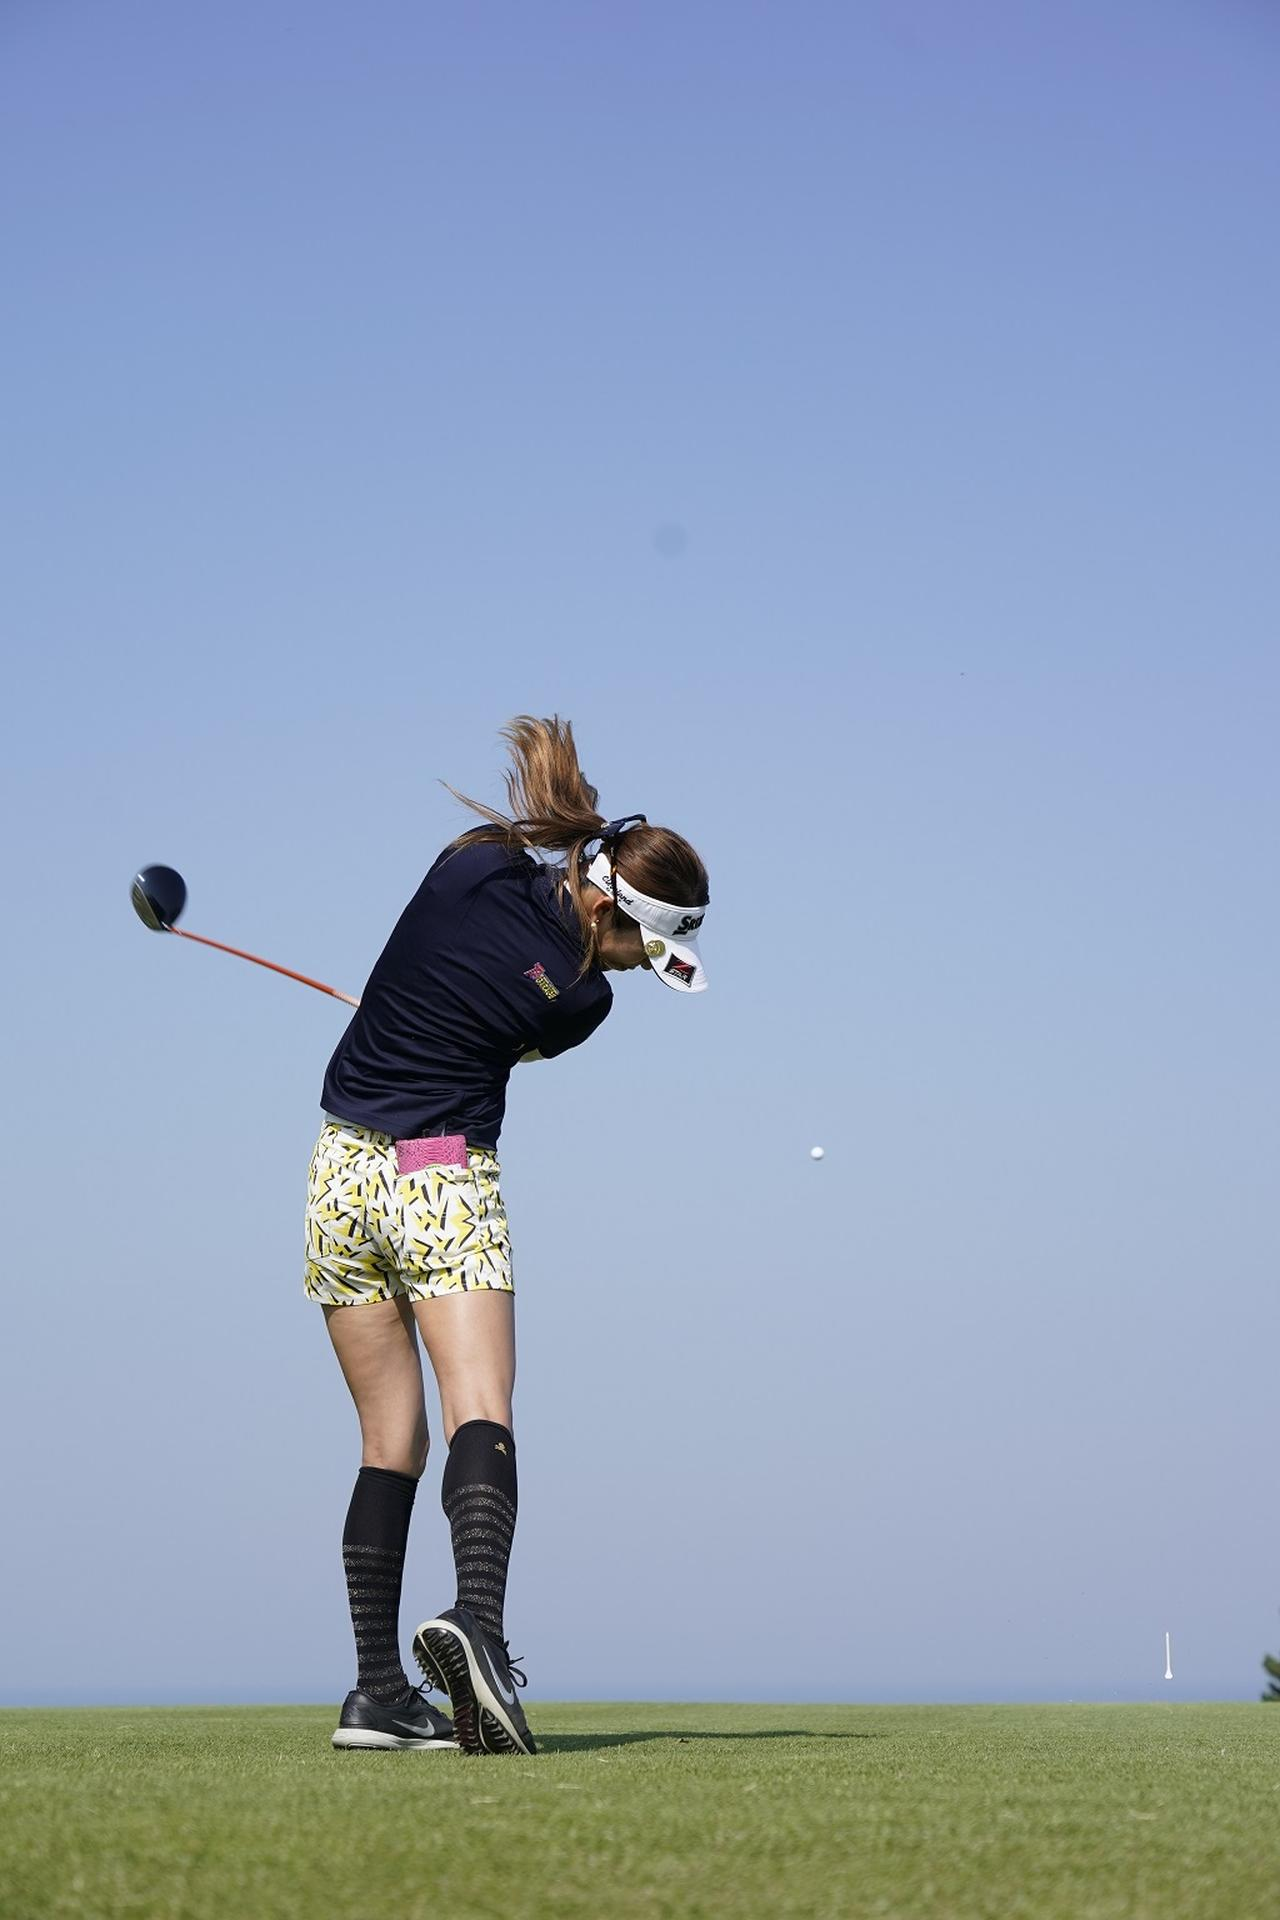 Images : 11番目の画像 - 金田久美子ドライバー後方連続写真 - みんなのゴルフダイジェスト